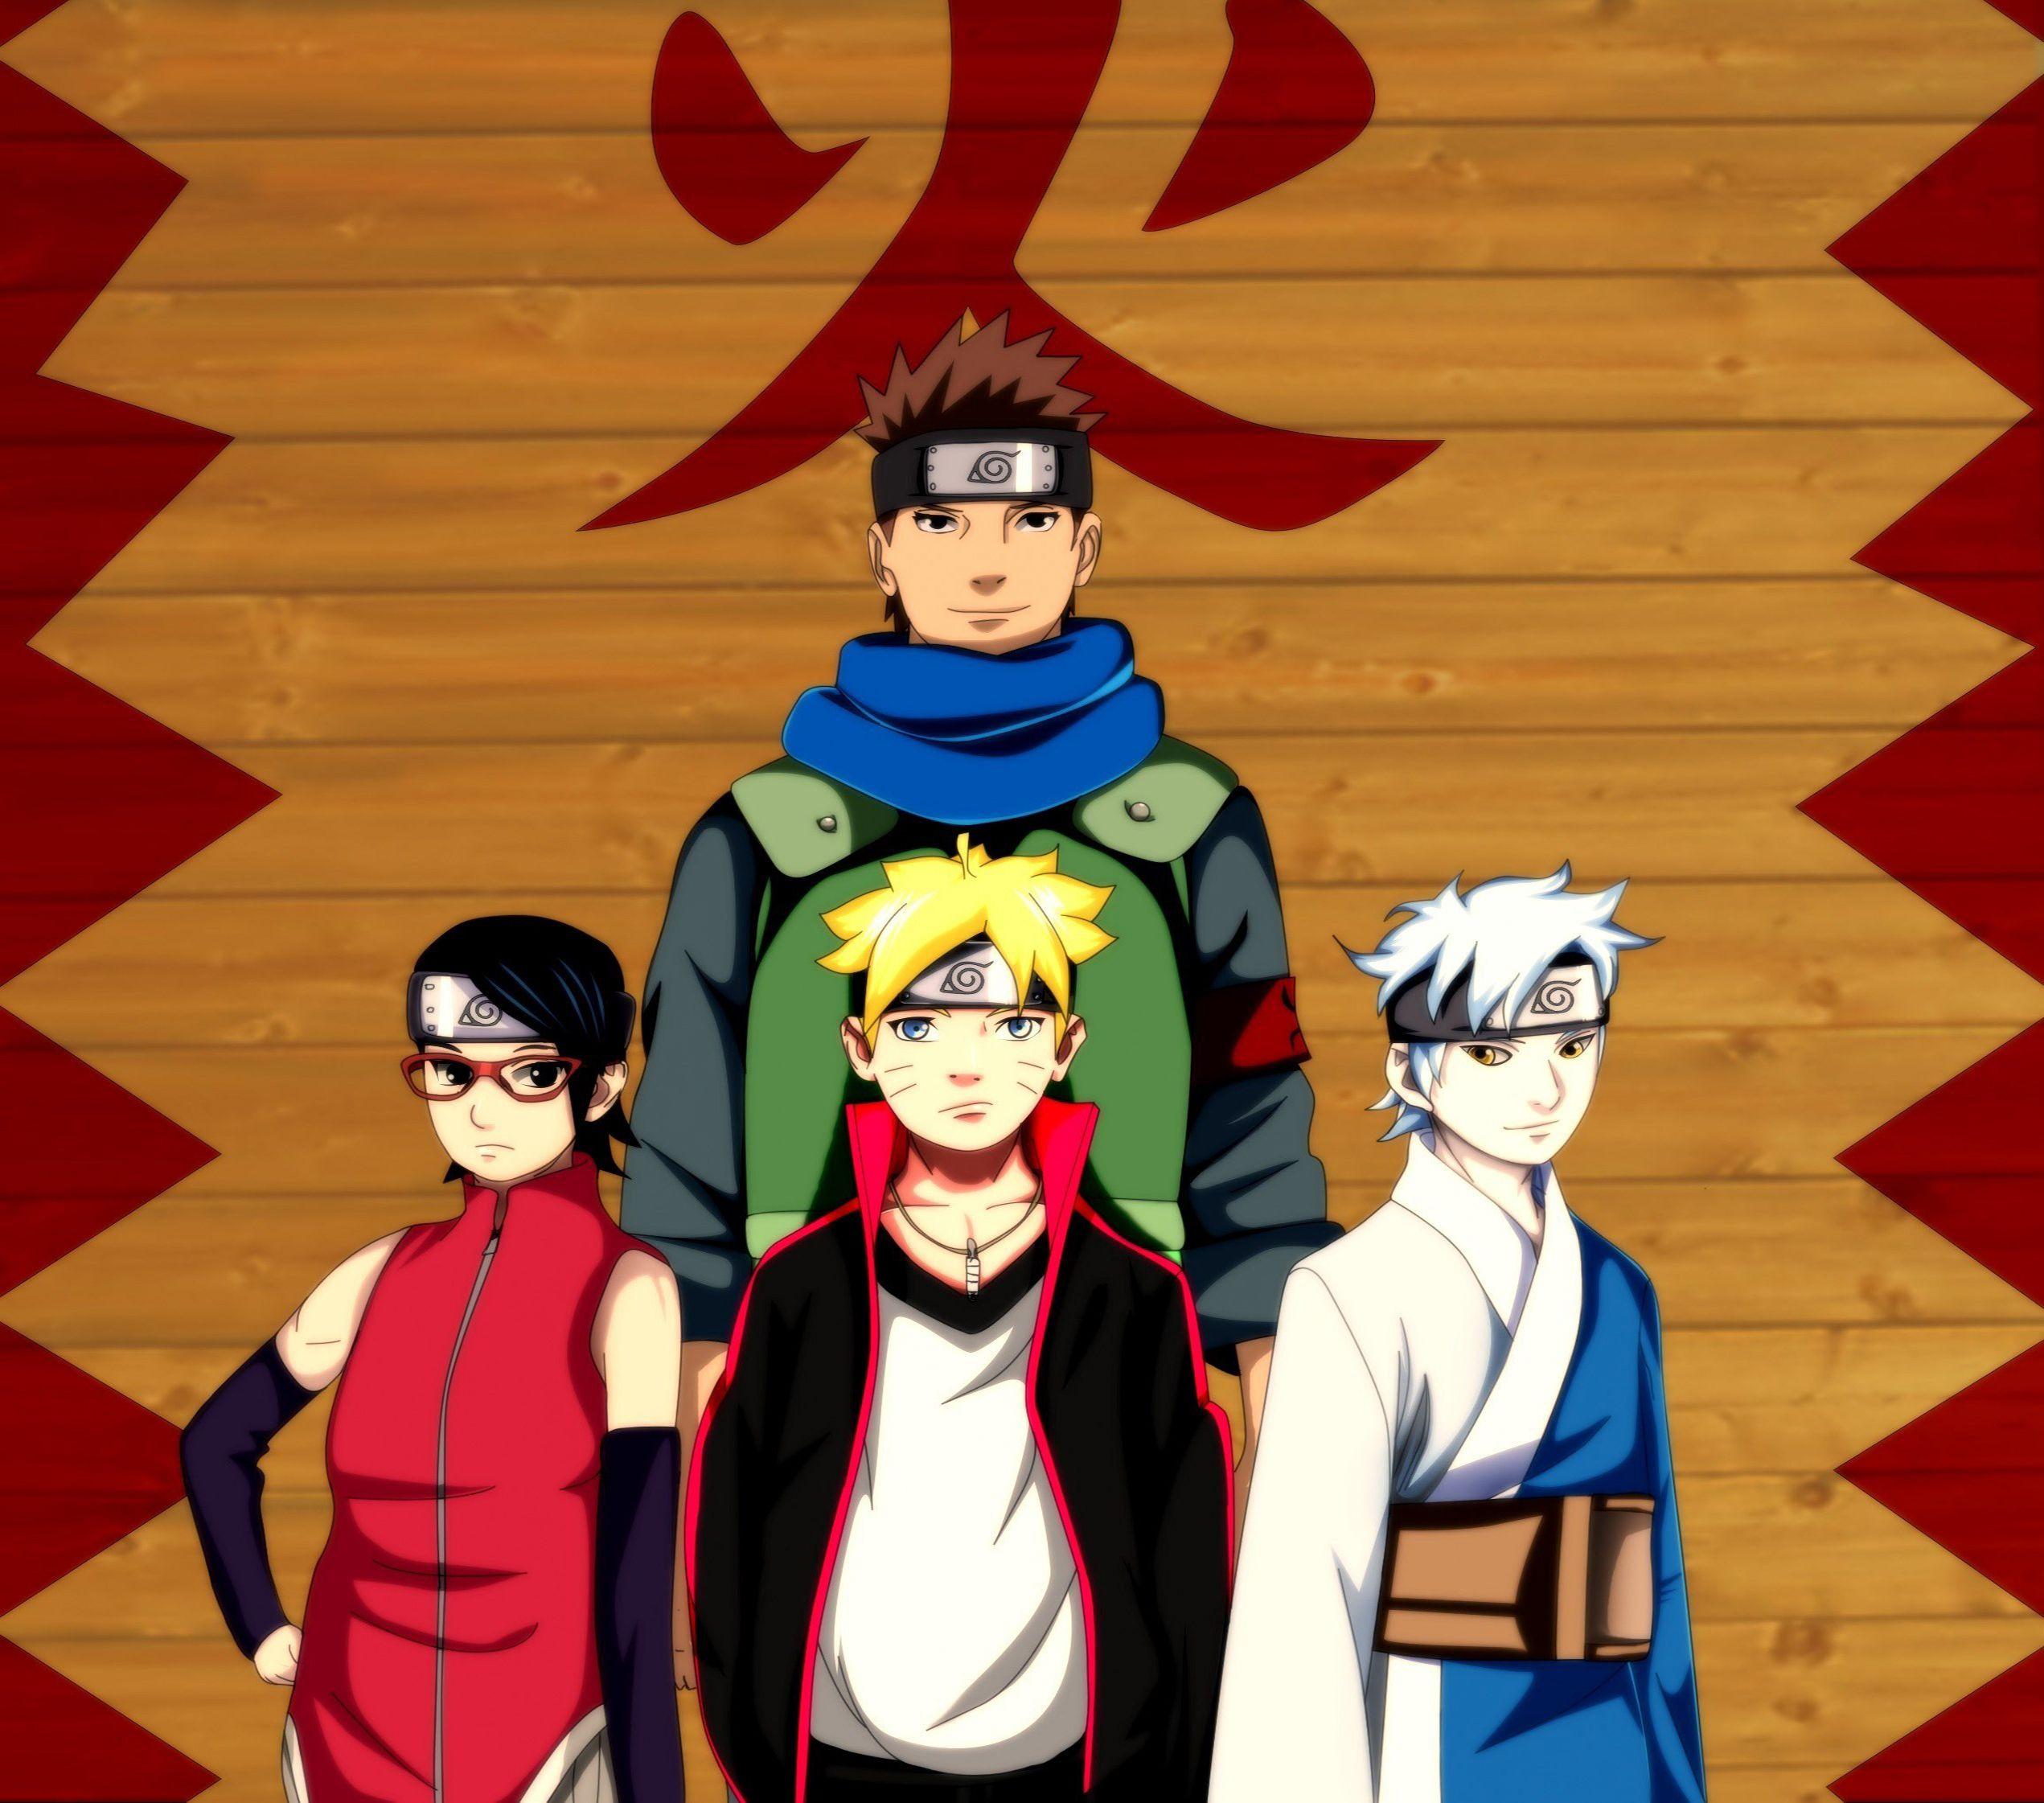 Must see Wallpaper Naruto Boruto - 9259d079df3271f997d52b42a9b00621  You Should Have_201210.jpg